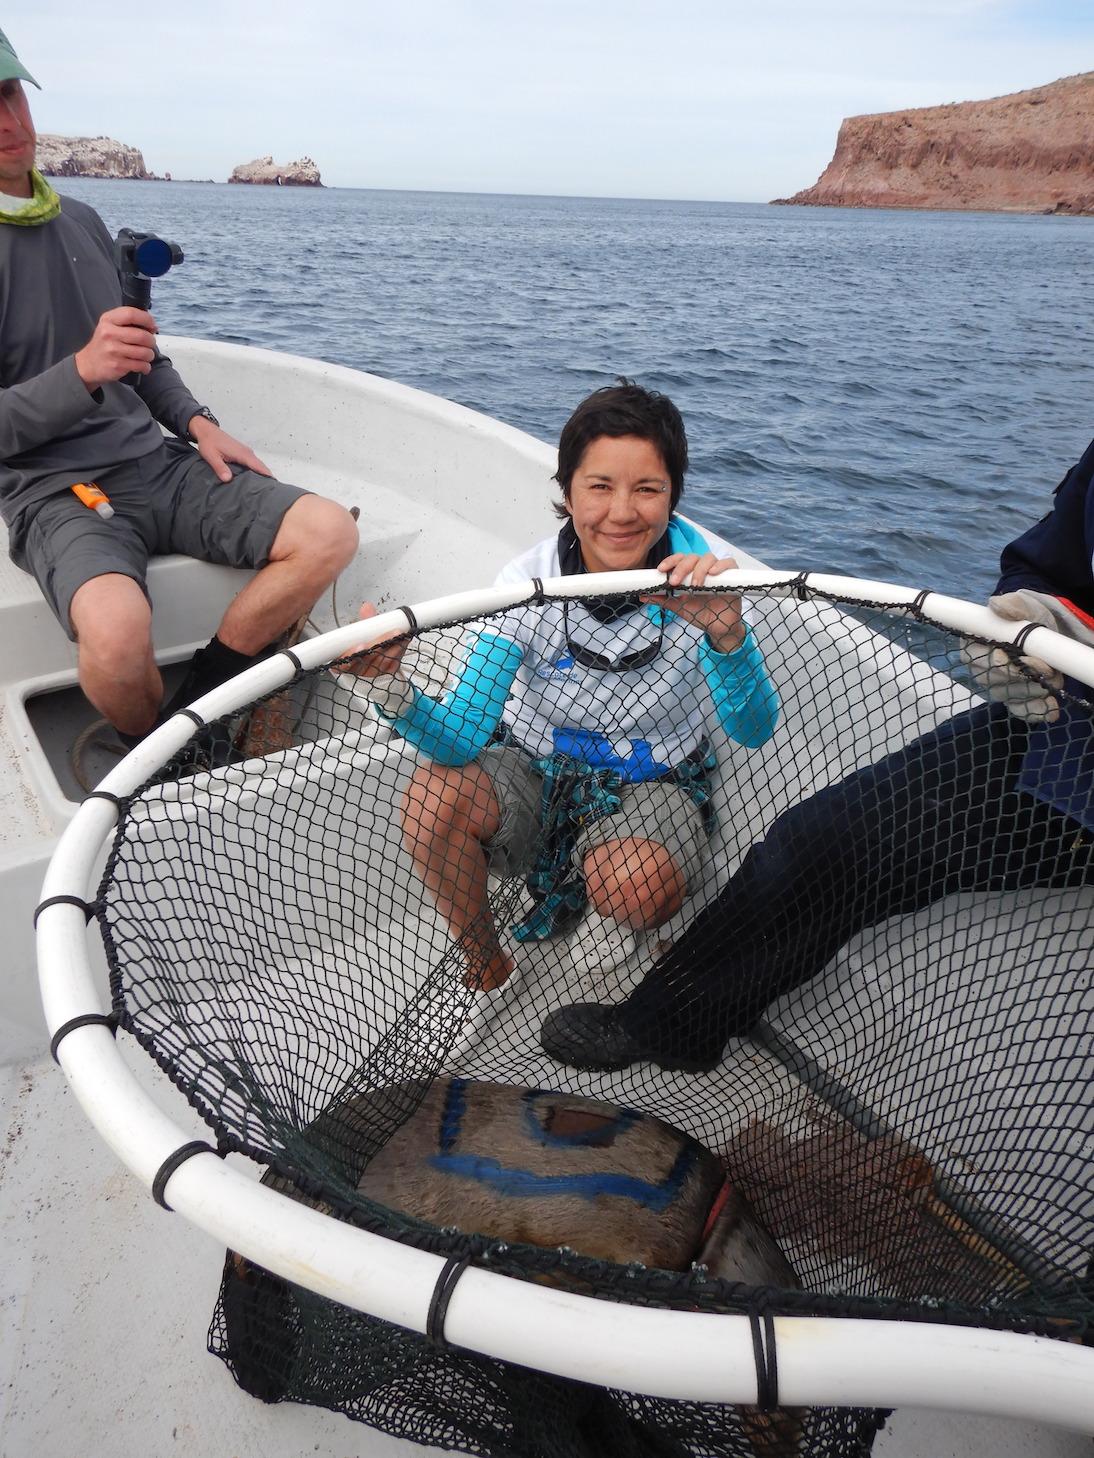 Eréndira Valle Padilla / Cabet Cultura y Ambiente / Protection de l'environnement / sauvegarde des mammifères marins